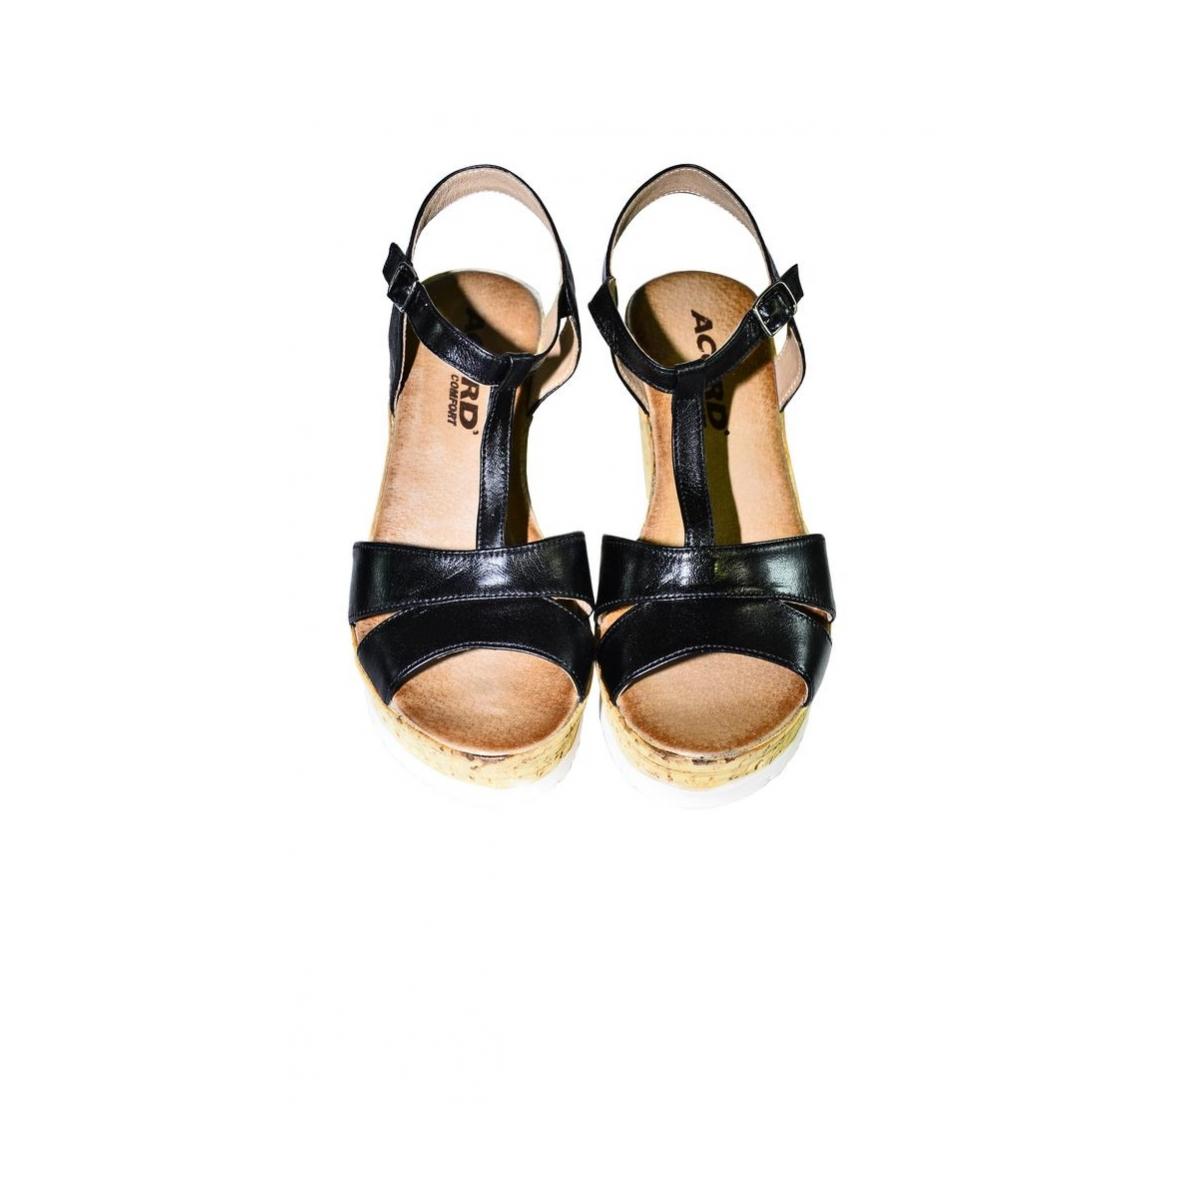 91063ac8751f Dámske čierne letné sandále JENSE - 4